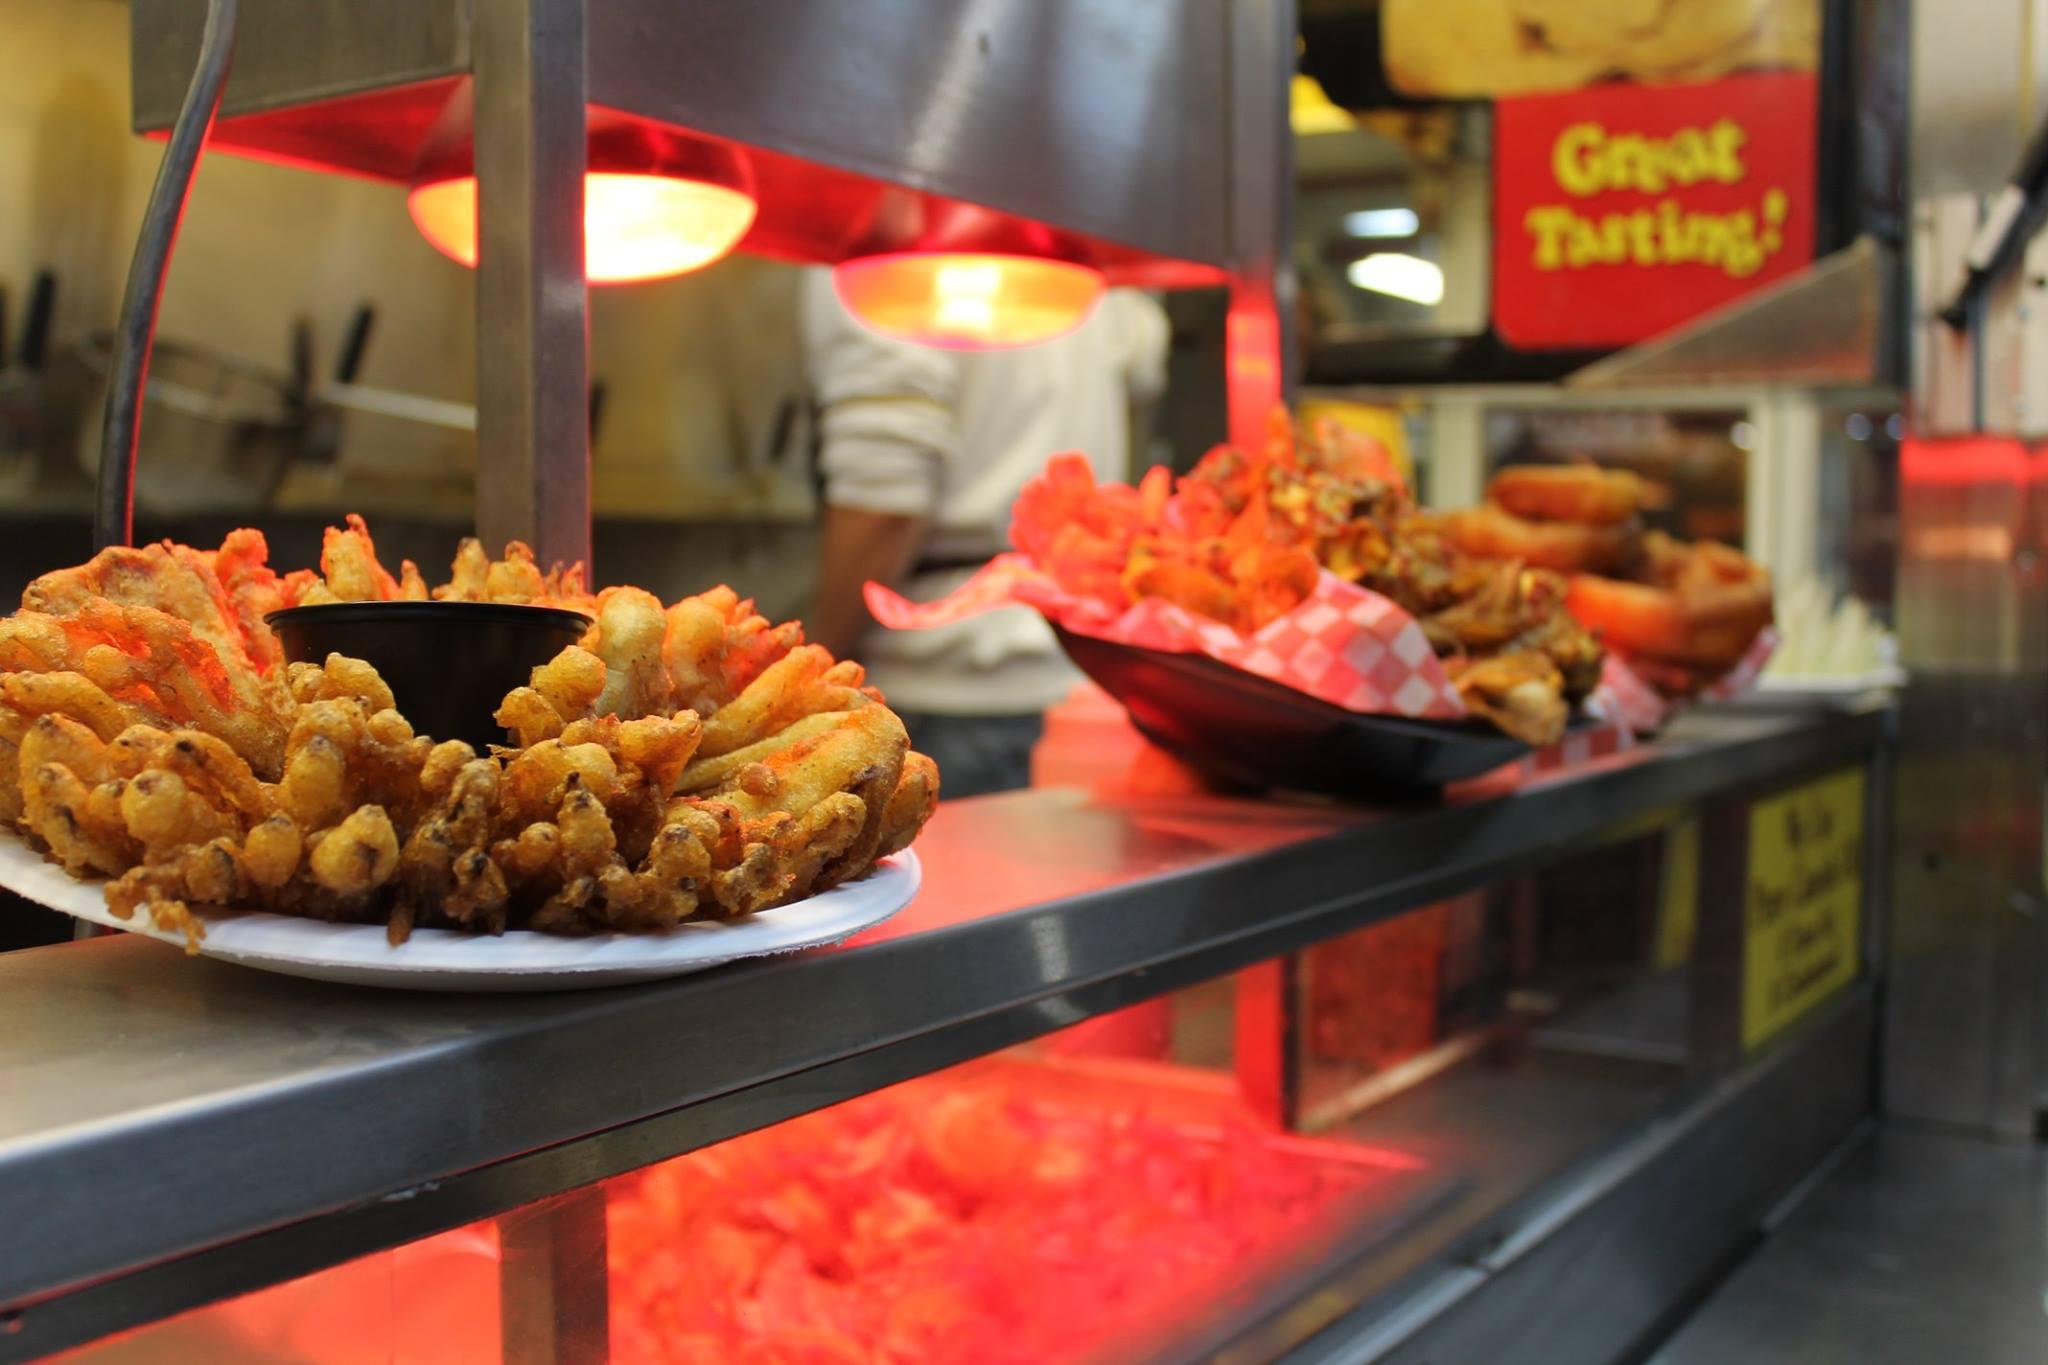 Markham Fair food events